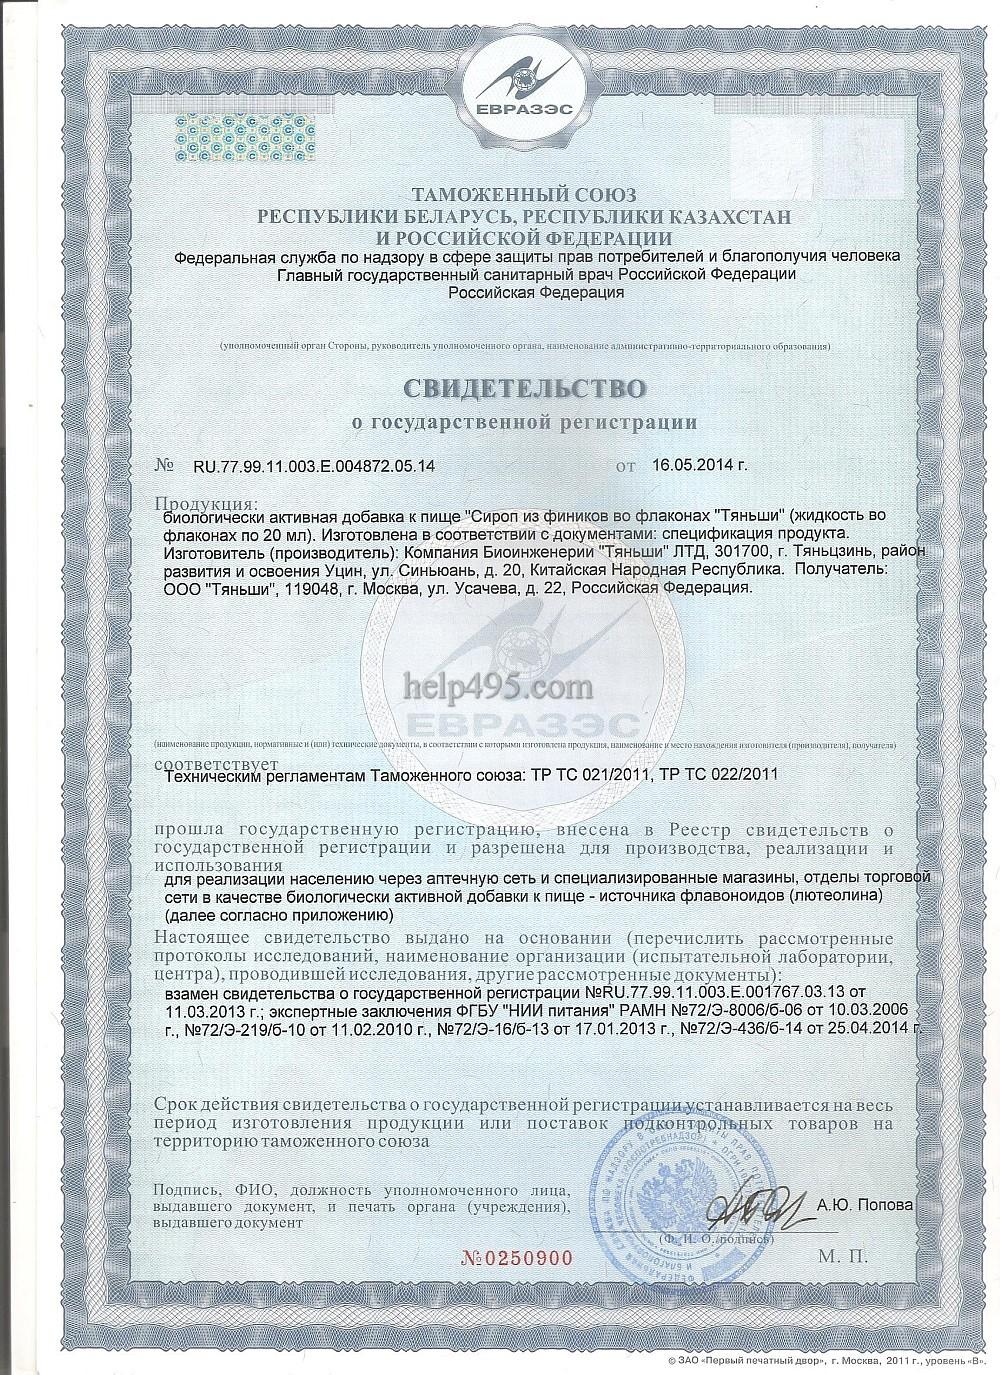 2-ая стр. сертификата препарата: Сироп из фиников во флаконах Тяньши